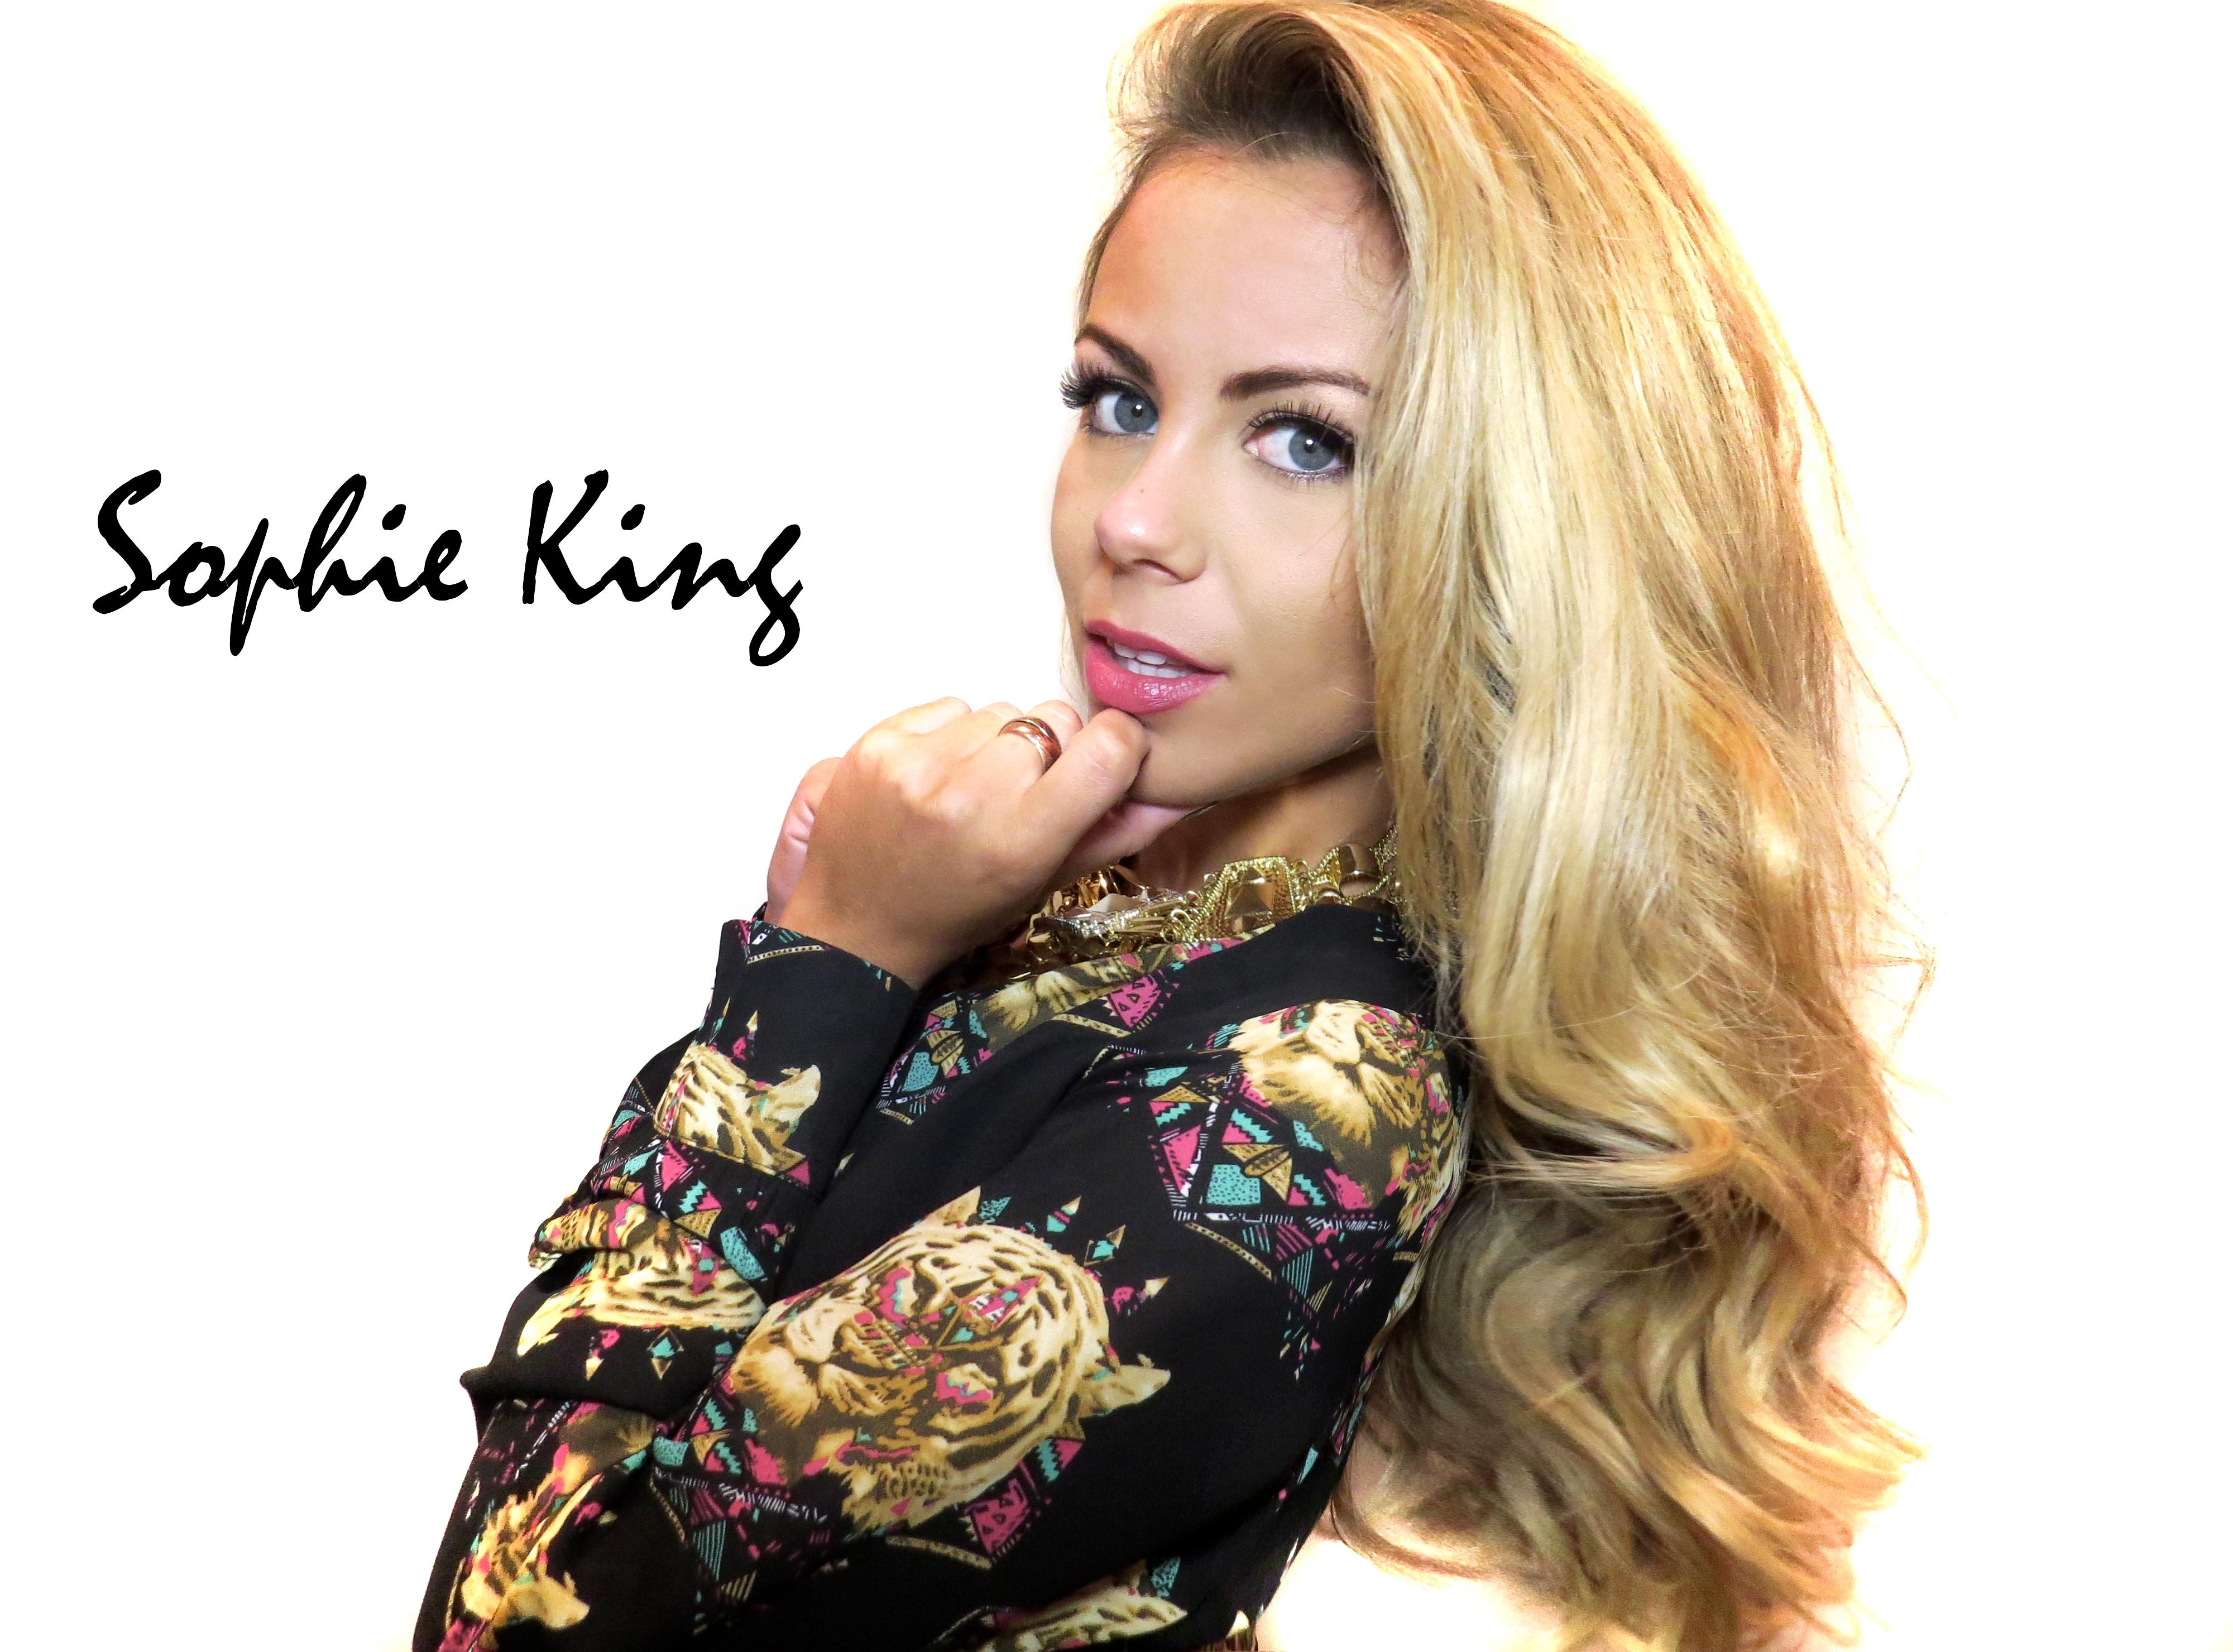 Sophie King